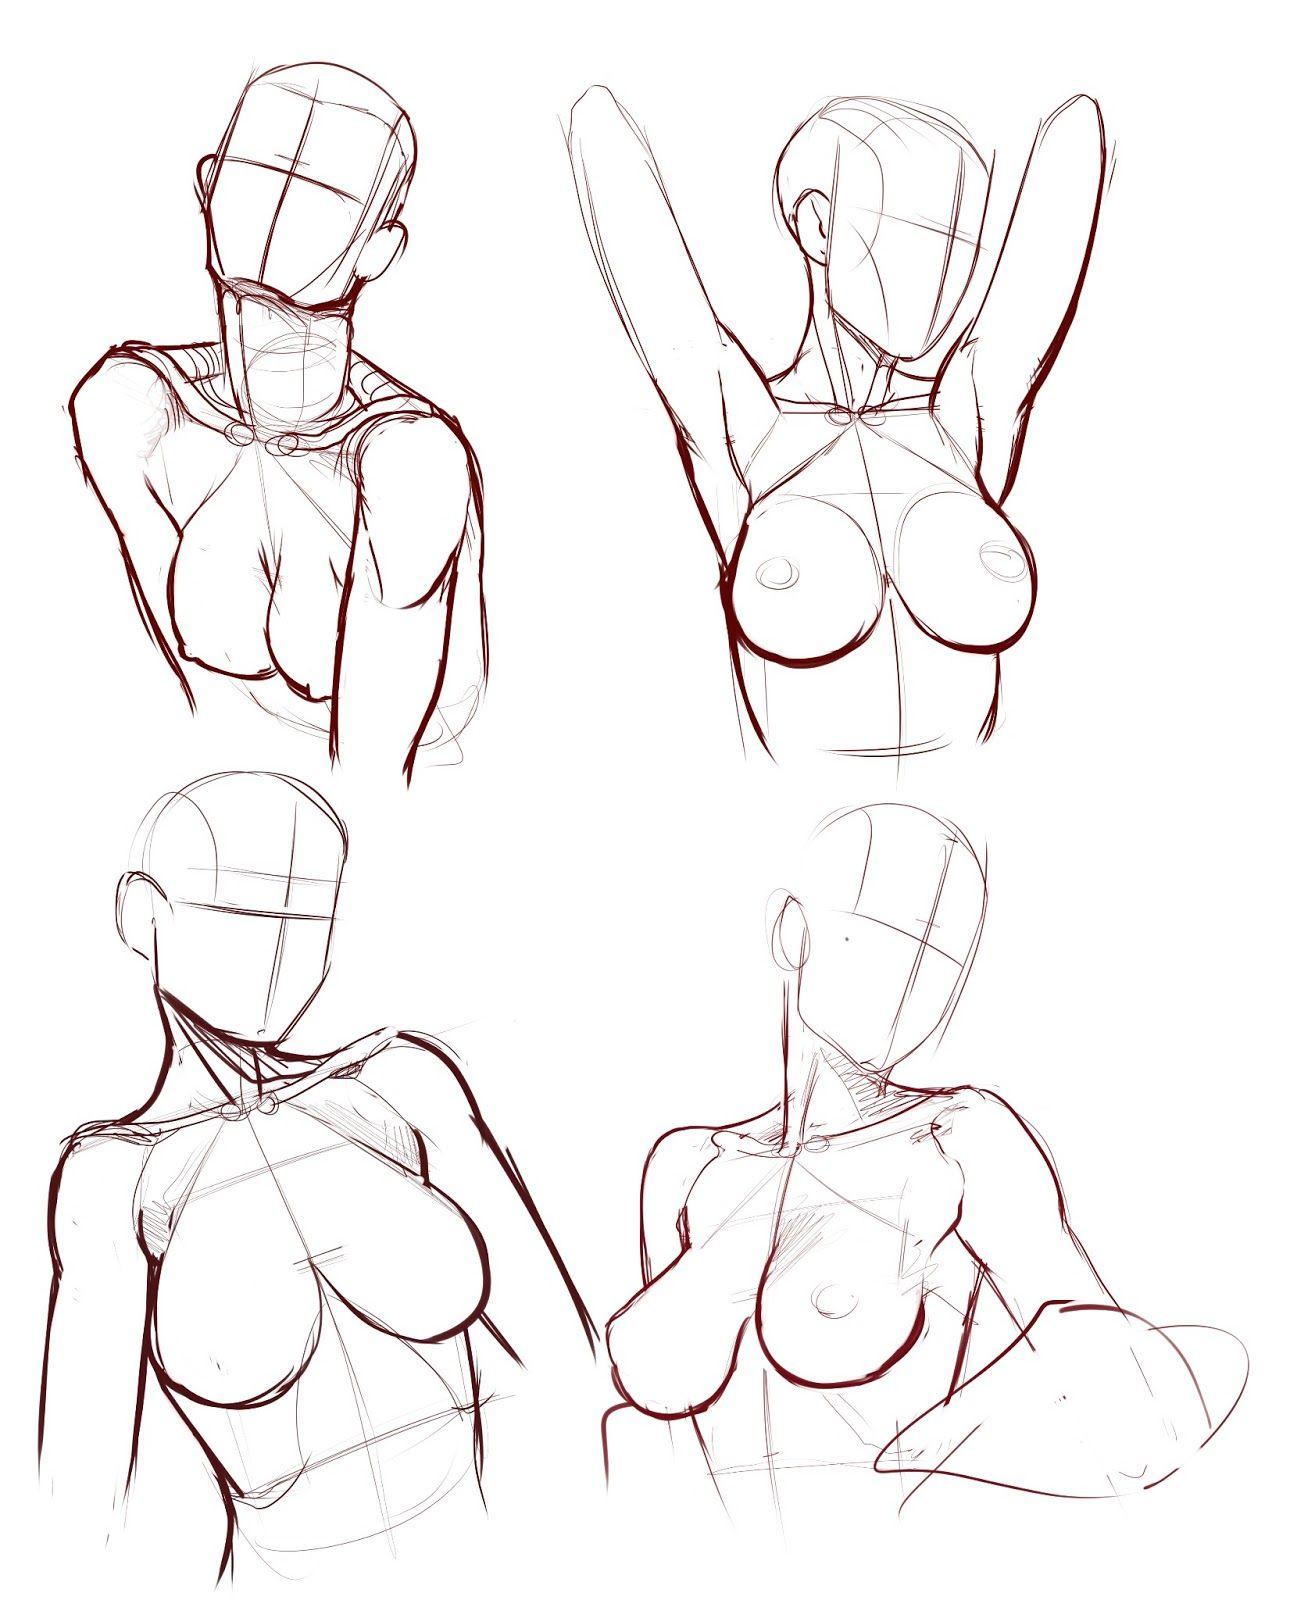 Estructuras simétricas de cuerpo femenino | dibujo | Pinterest ...